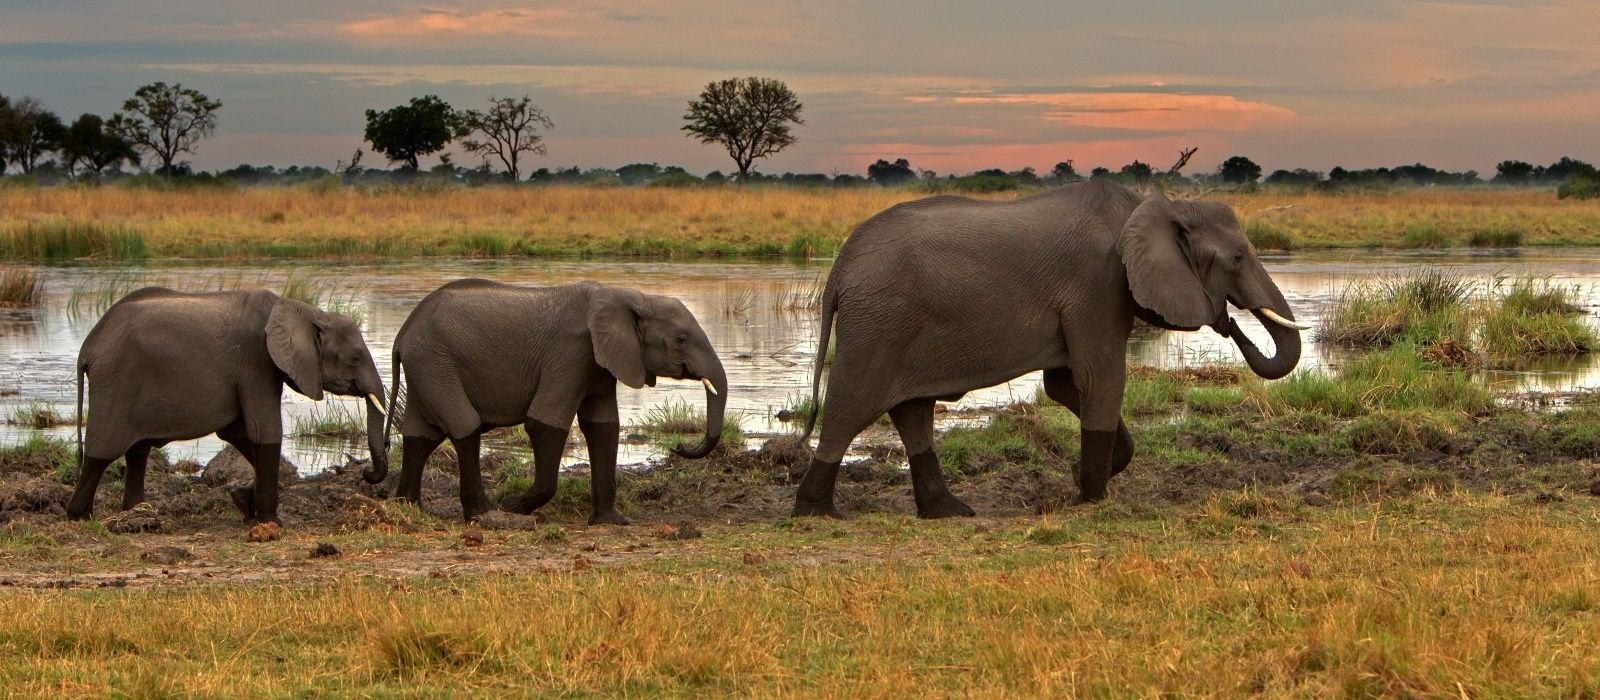 Drei Elefanten gehen Fluss entlang